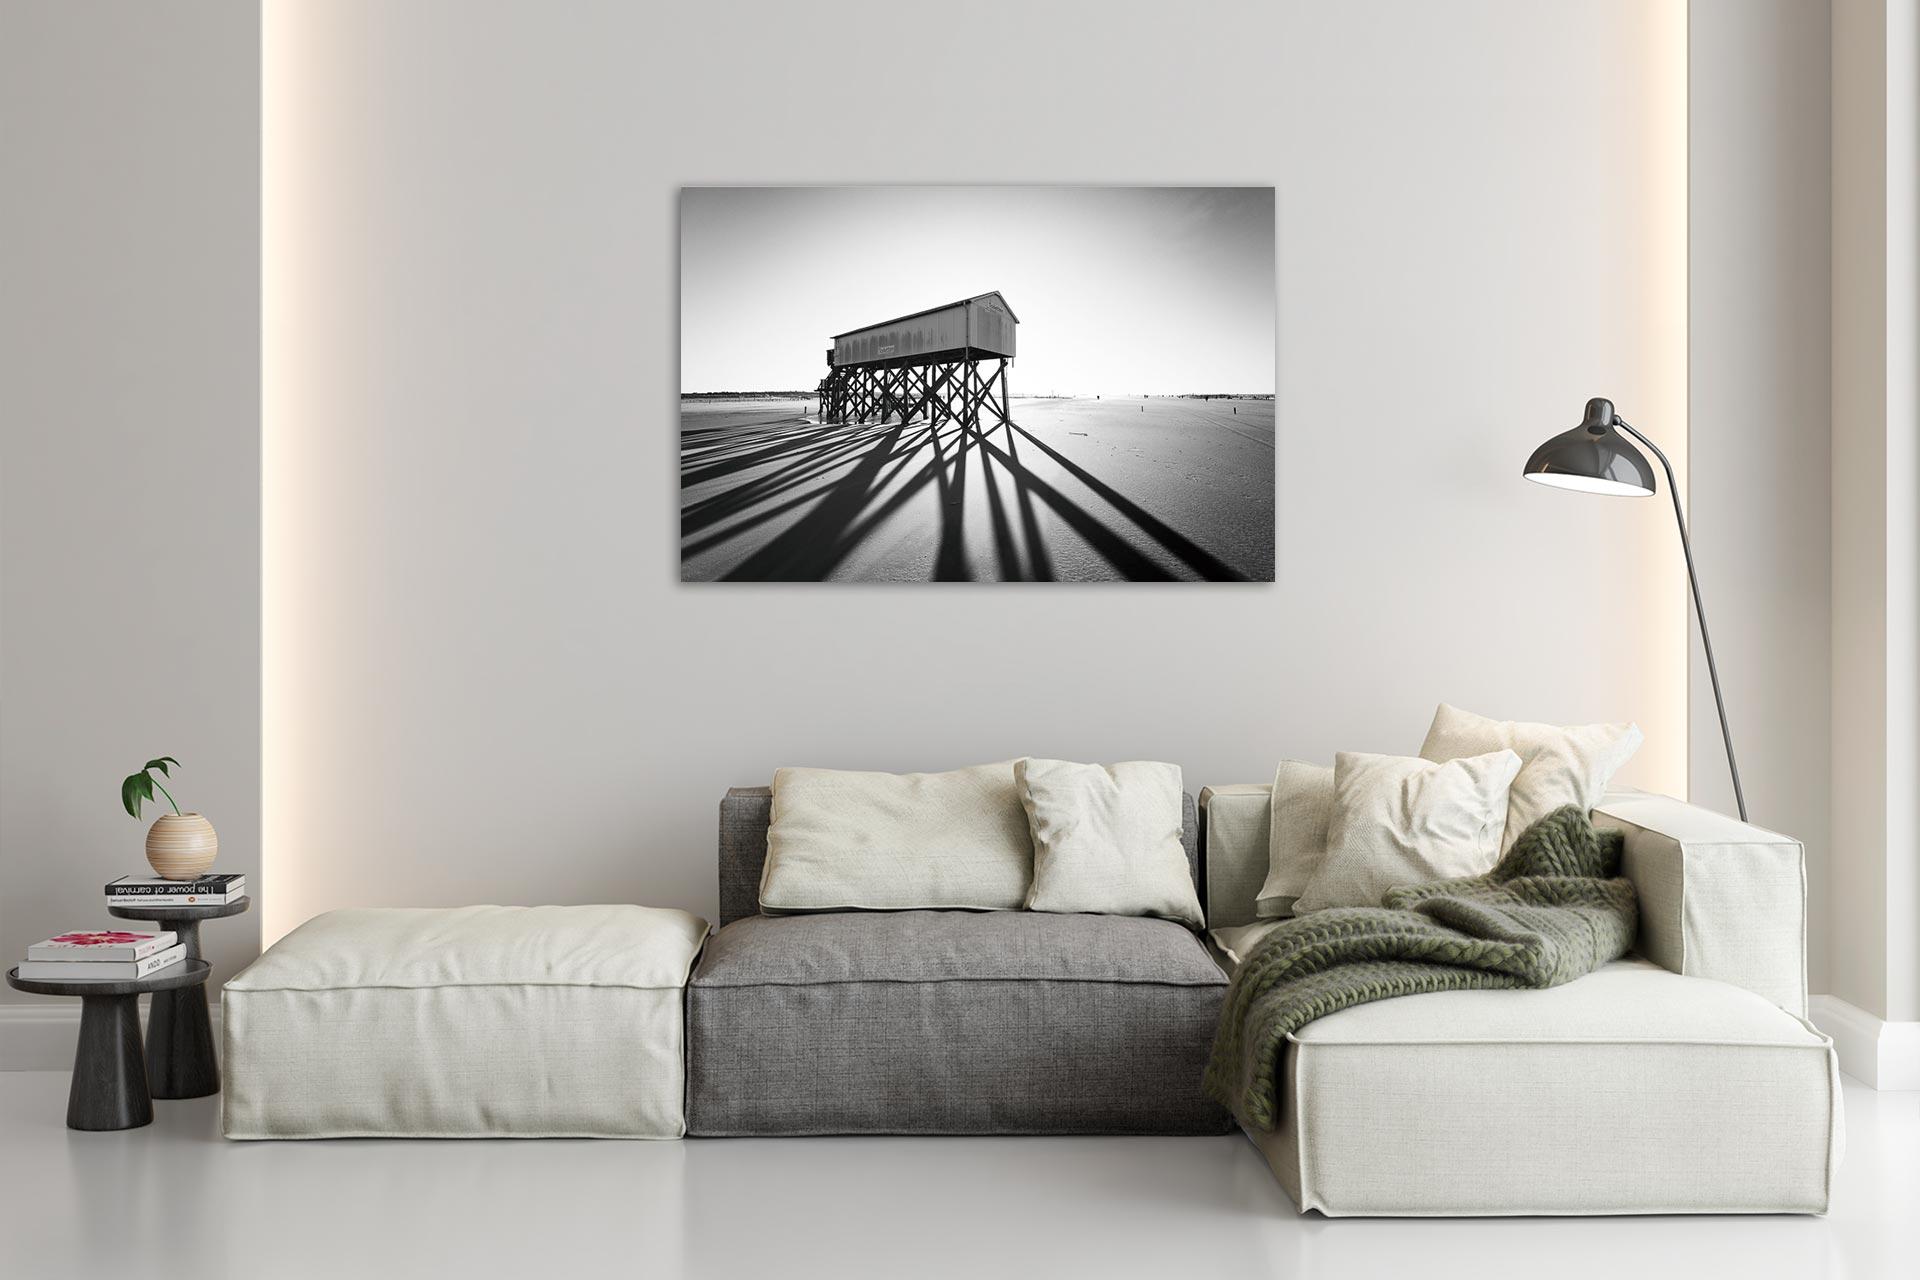 JS203-spo-3-wandbild-bild-auf-leinwand-acrylglas-aludibond-wohnzimmer